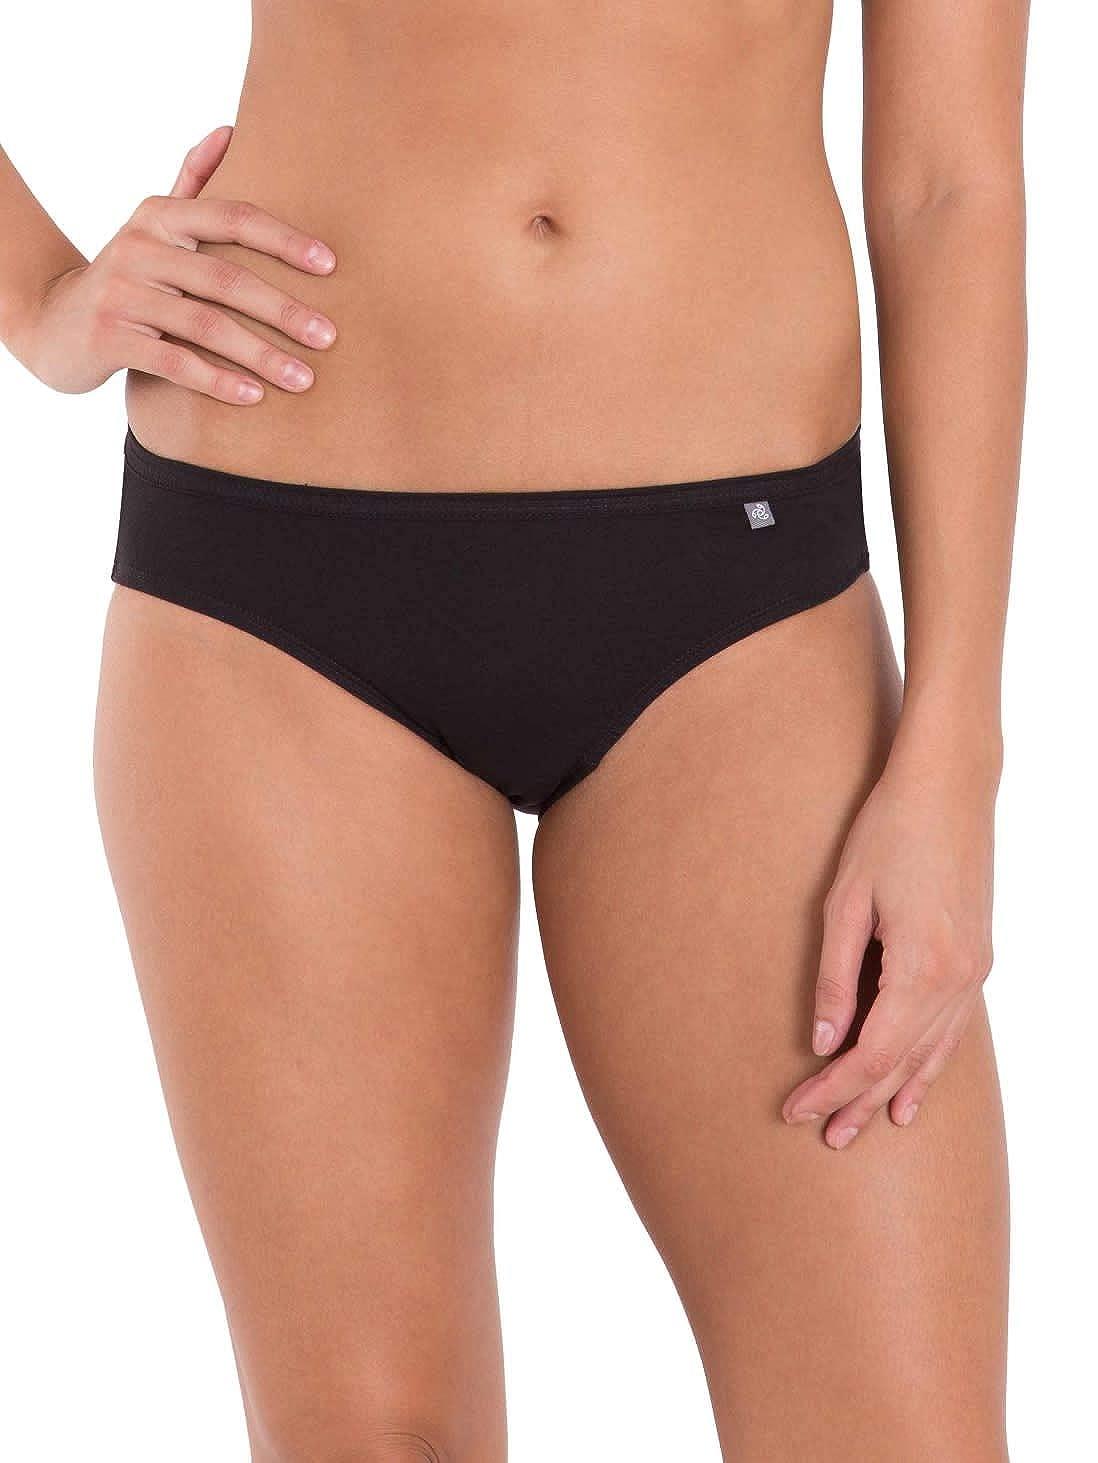 Jockey Women Cotton Bikini Panty(Colors and Prints may vary)